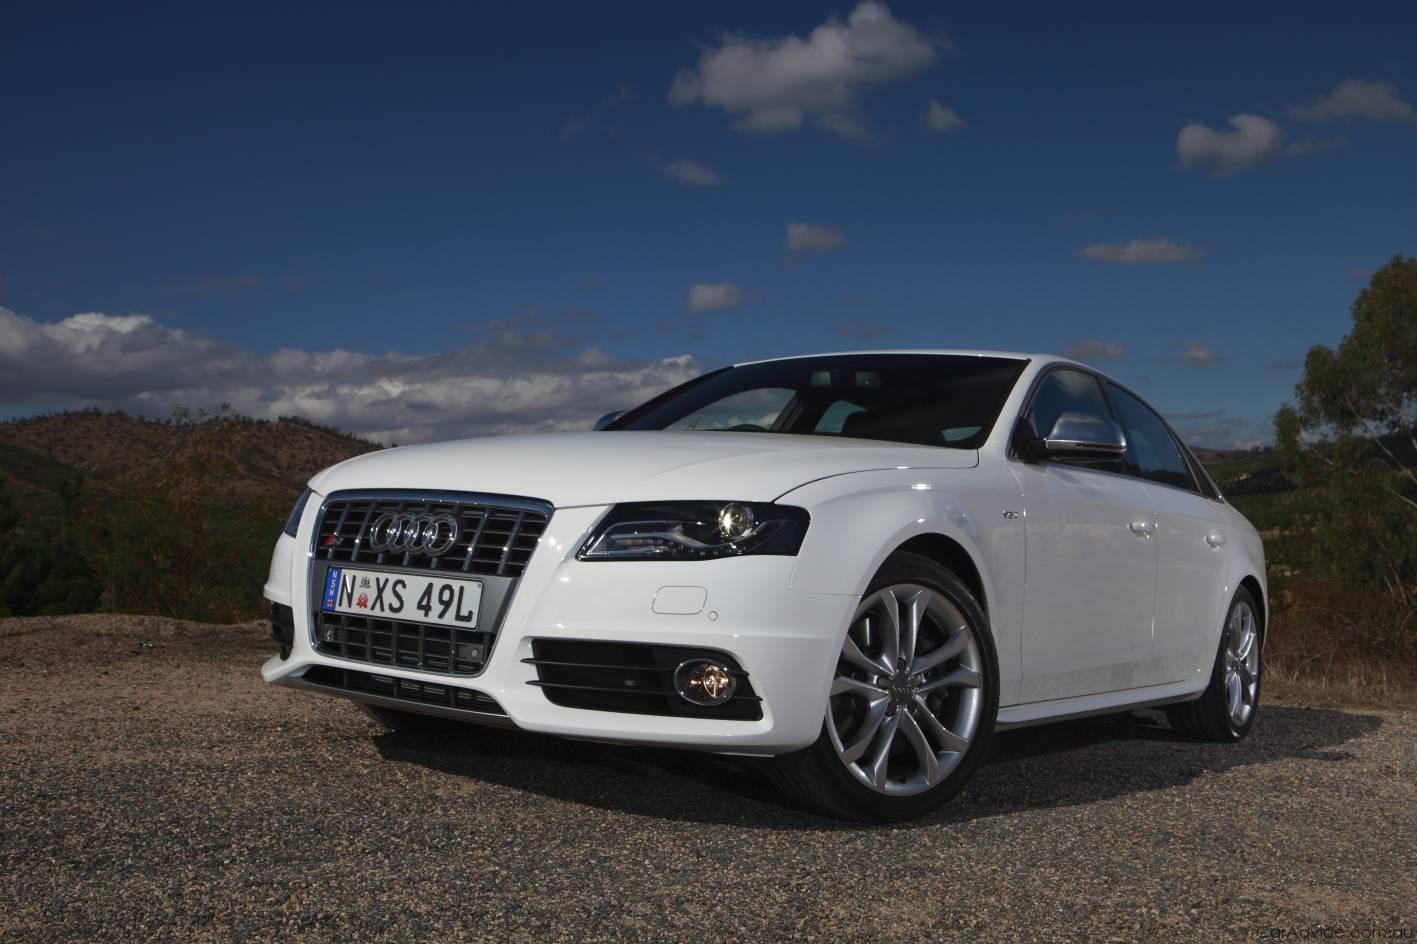 Audi S4 Wallpapers Audiwallpapers Net